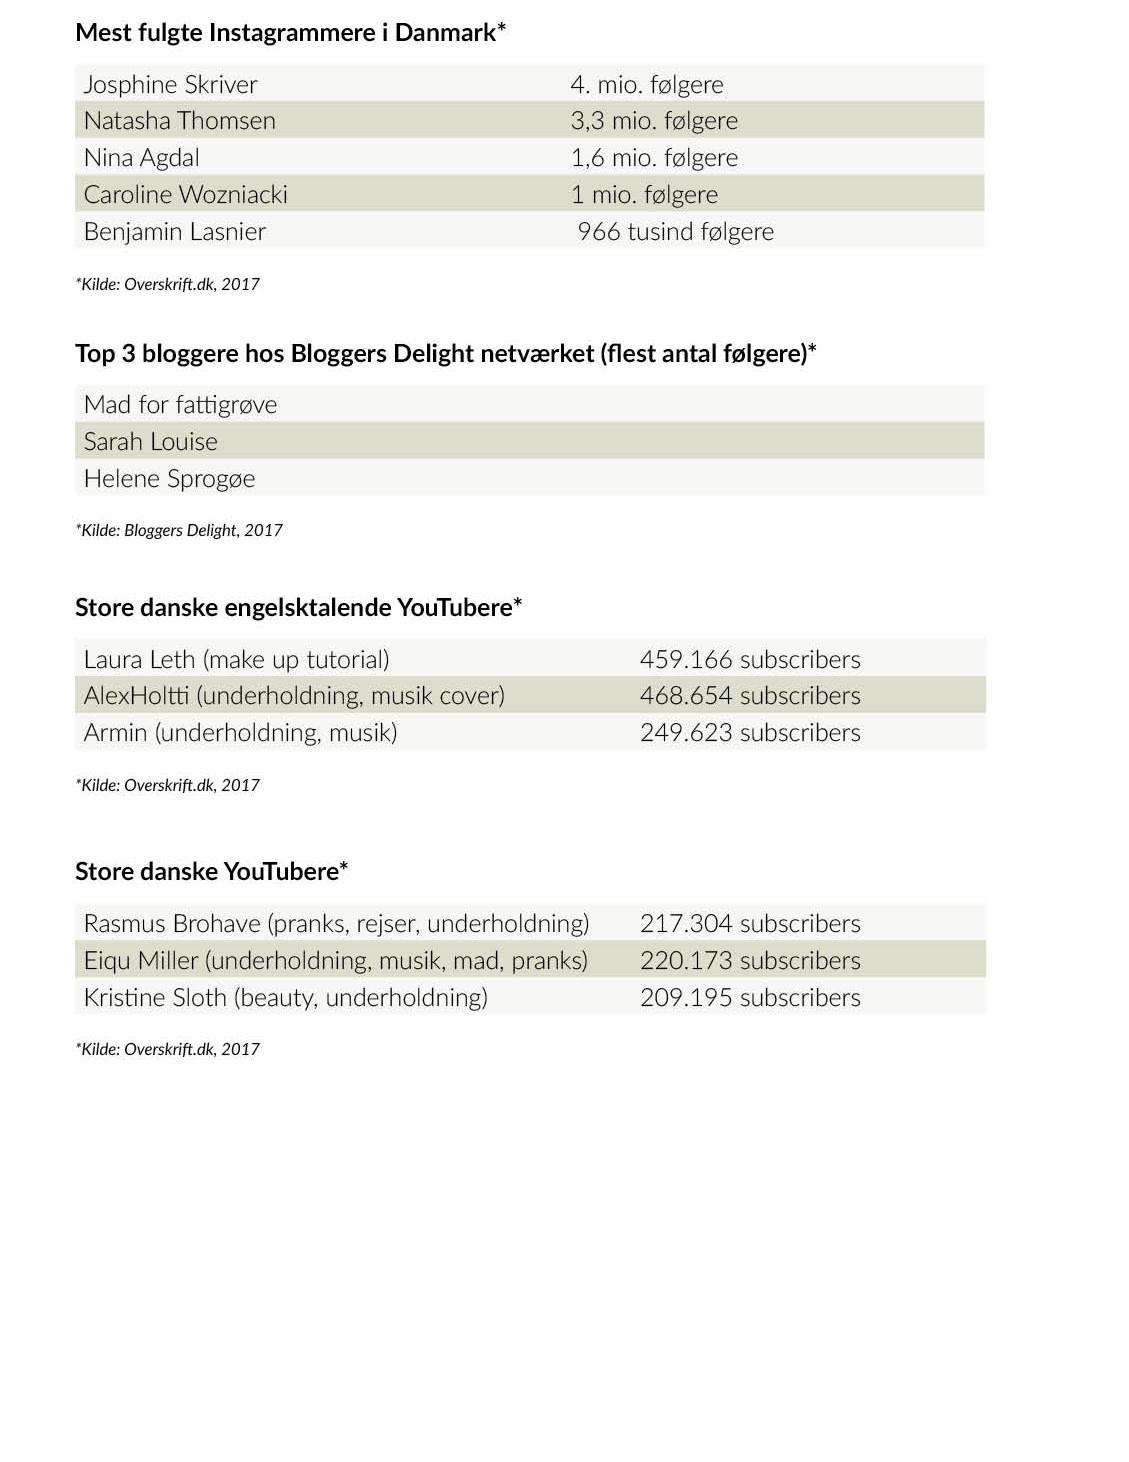 Danmarks største influencers 2017